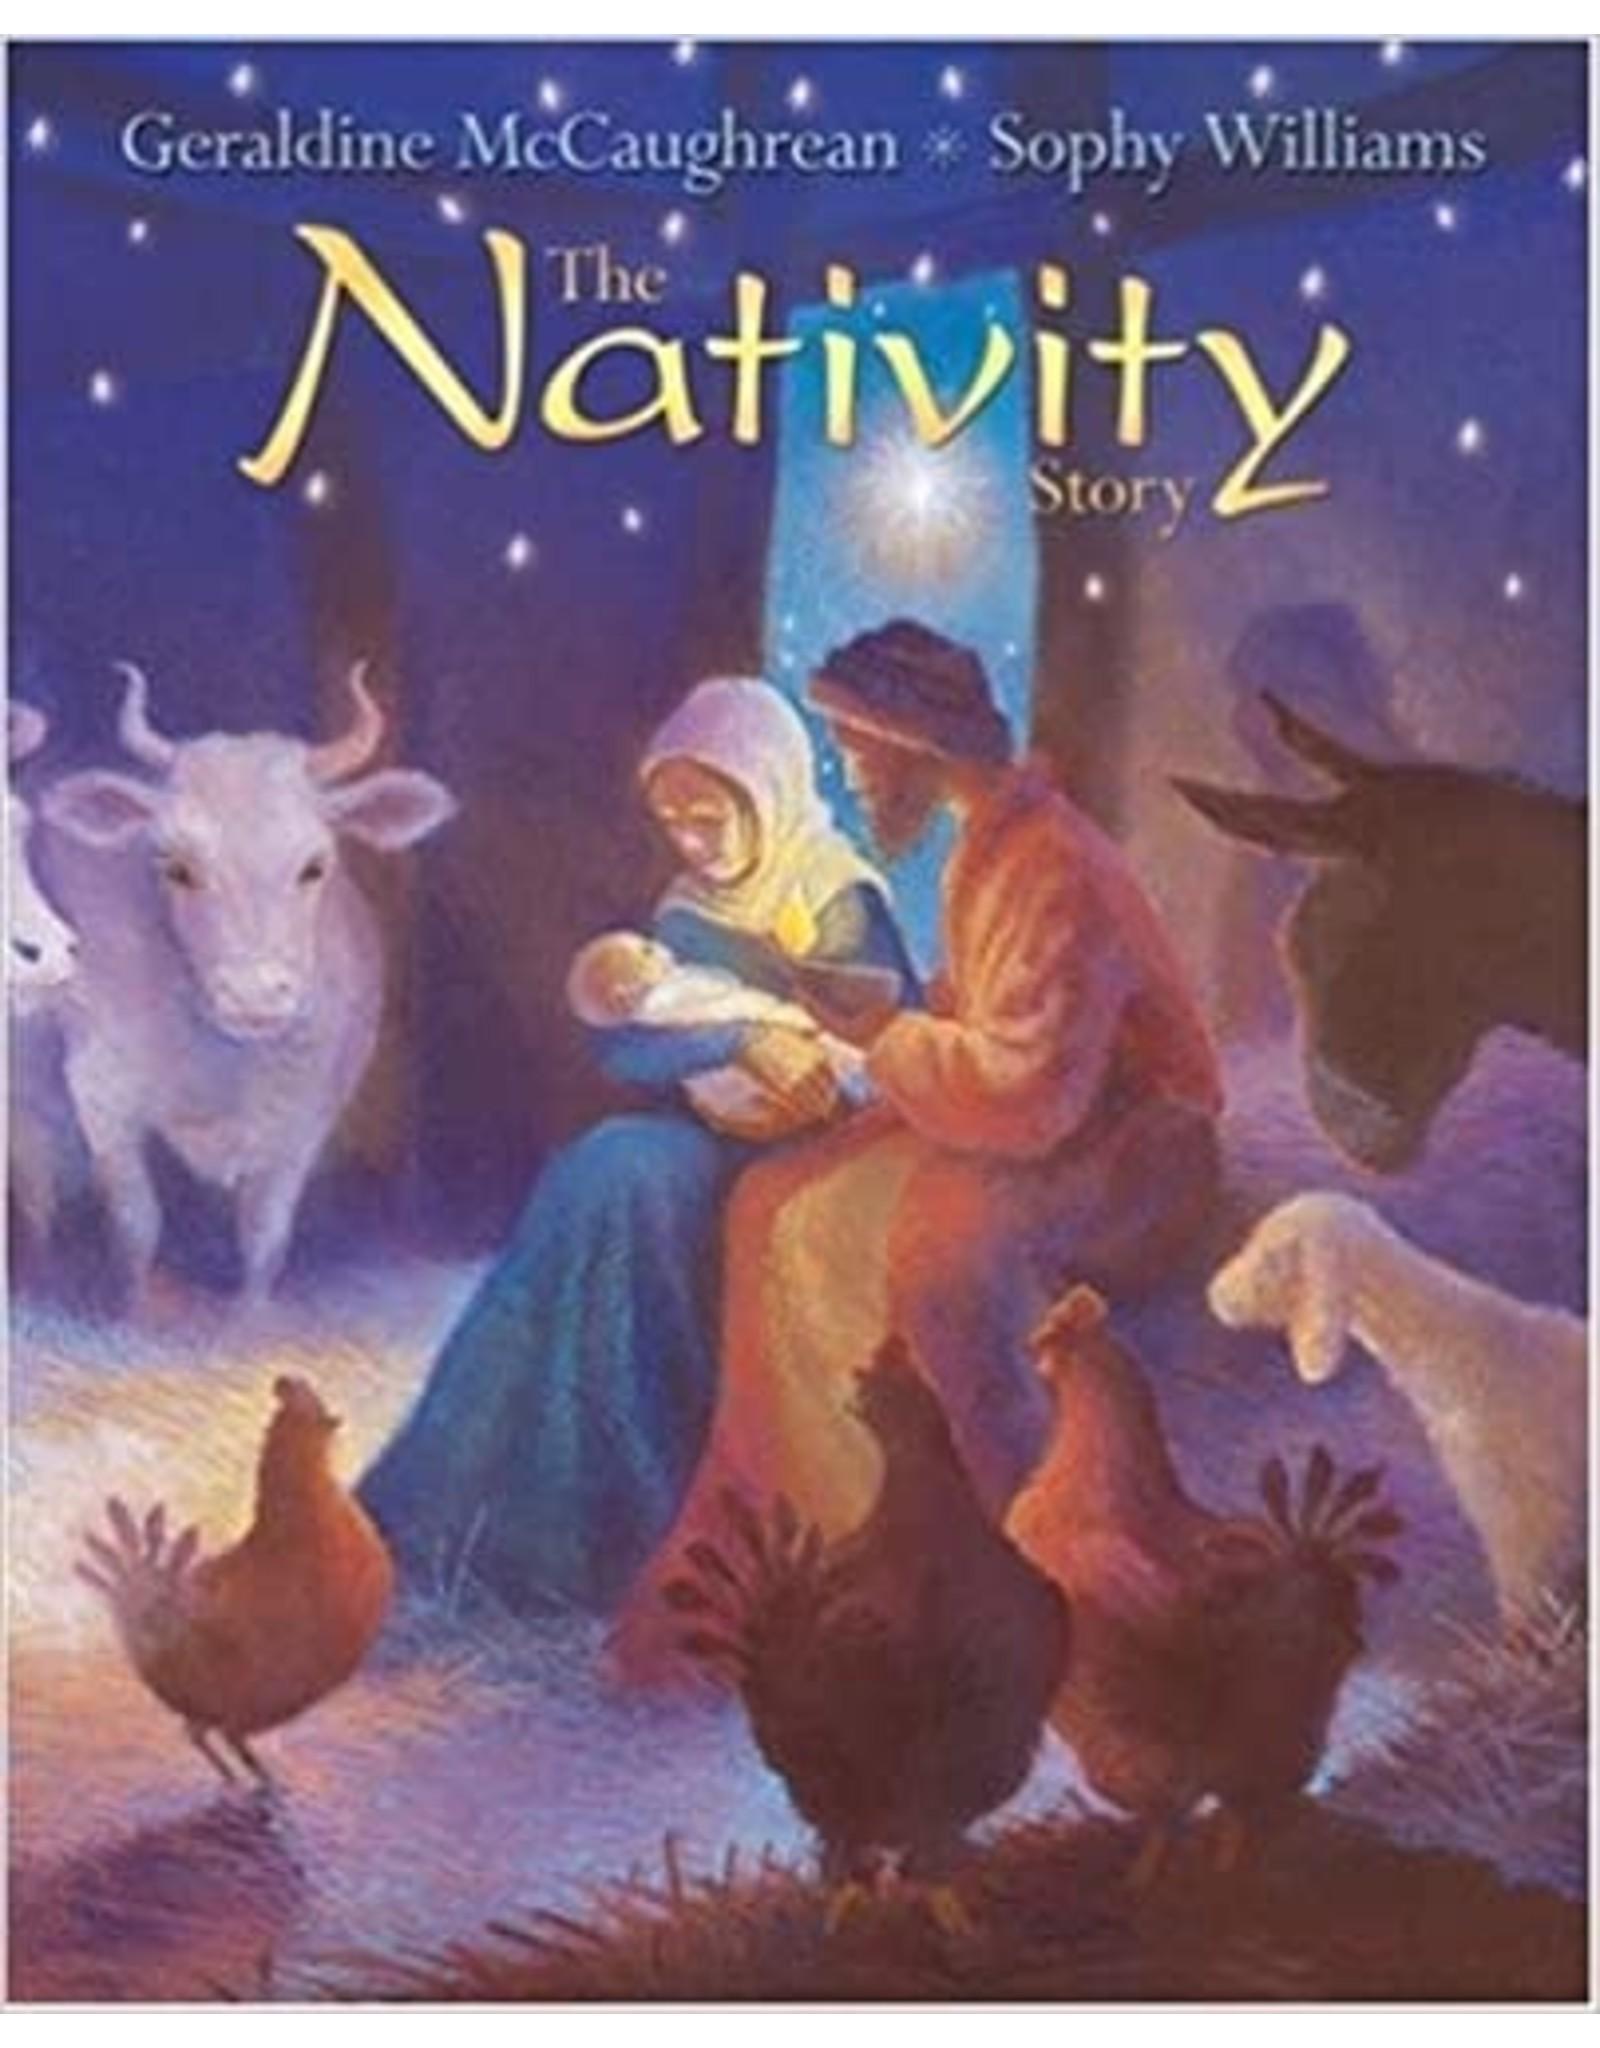 McCaughrean The Nativity Story